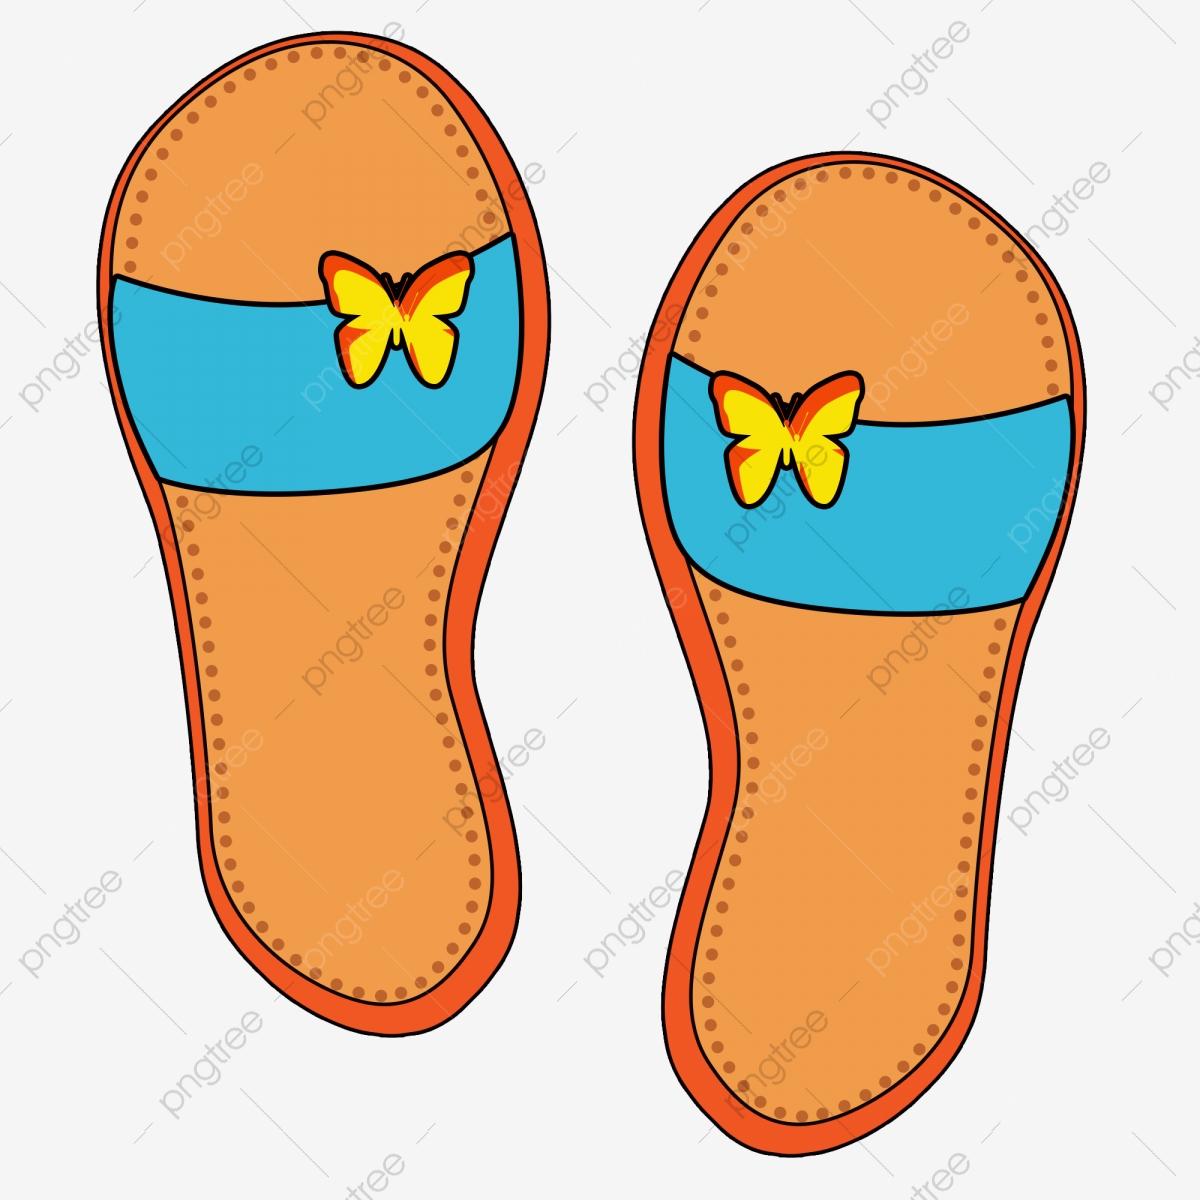 Flip flop orange slippers. Oranges clipart slipper